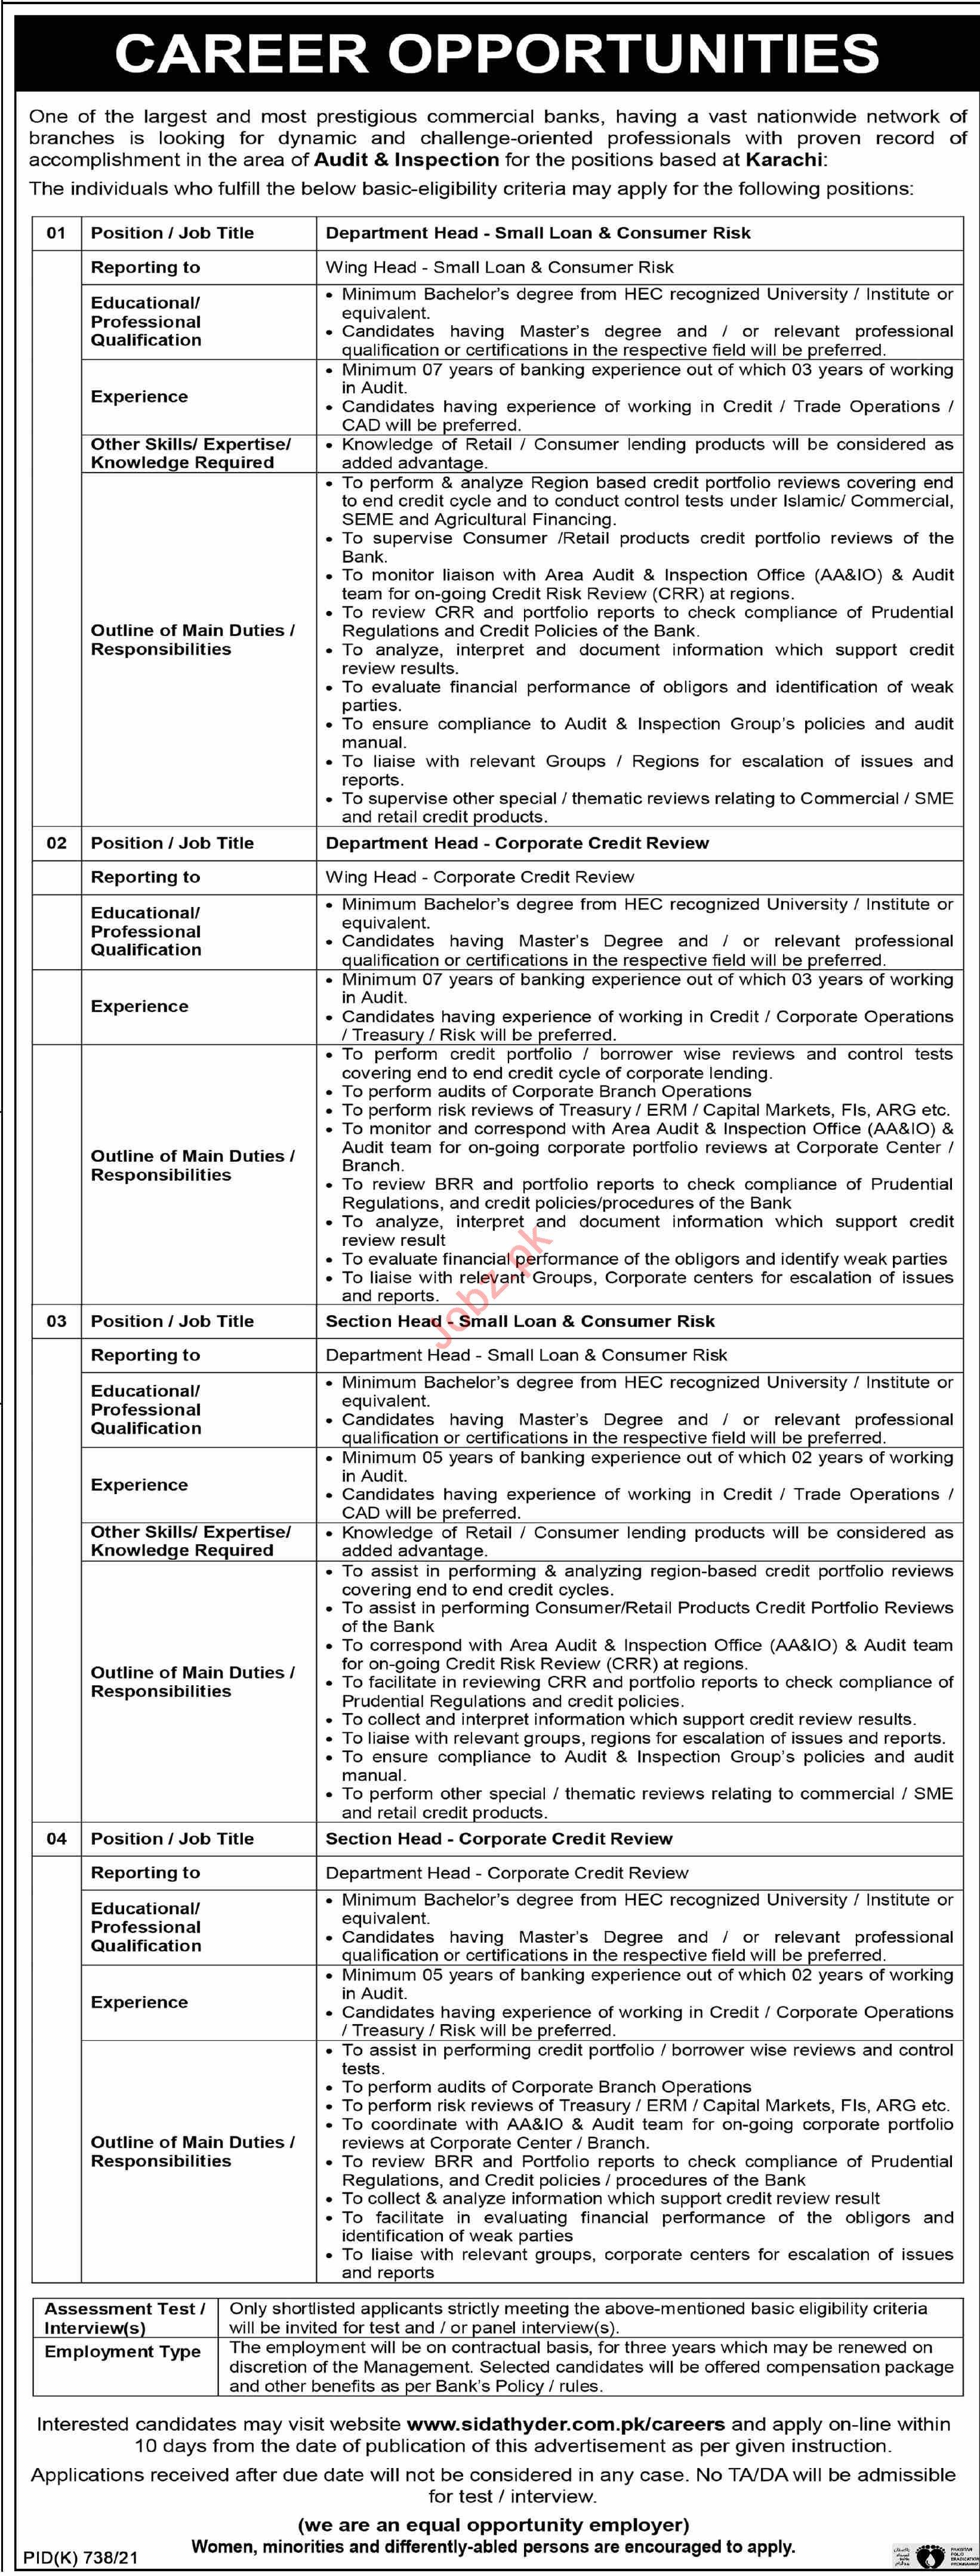 Sidat Hyder Morshed Associates Jobs in Karachi